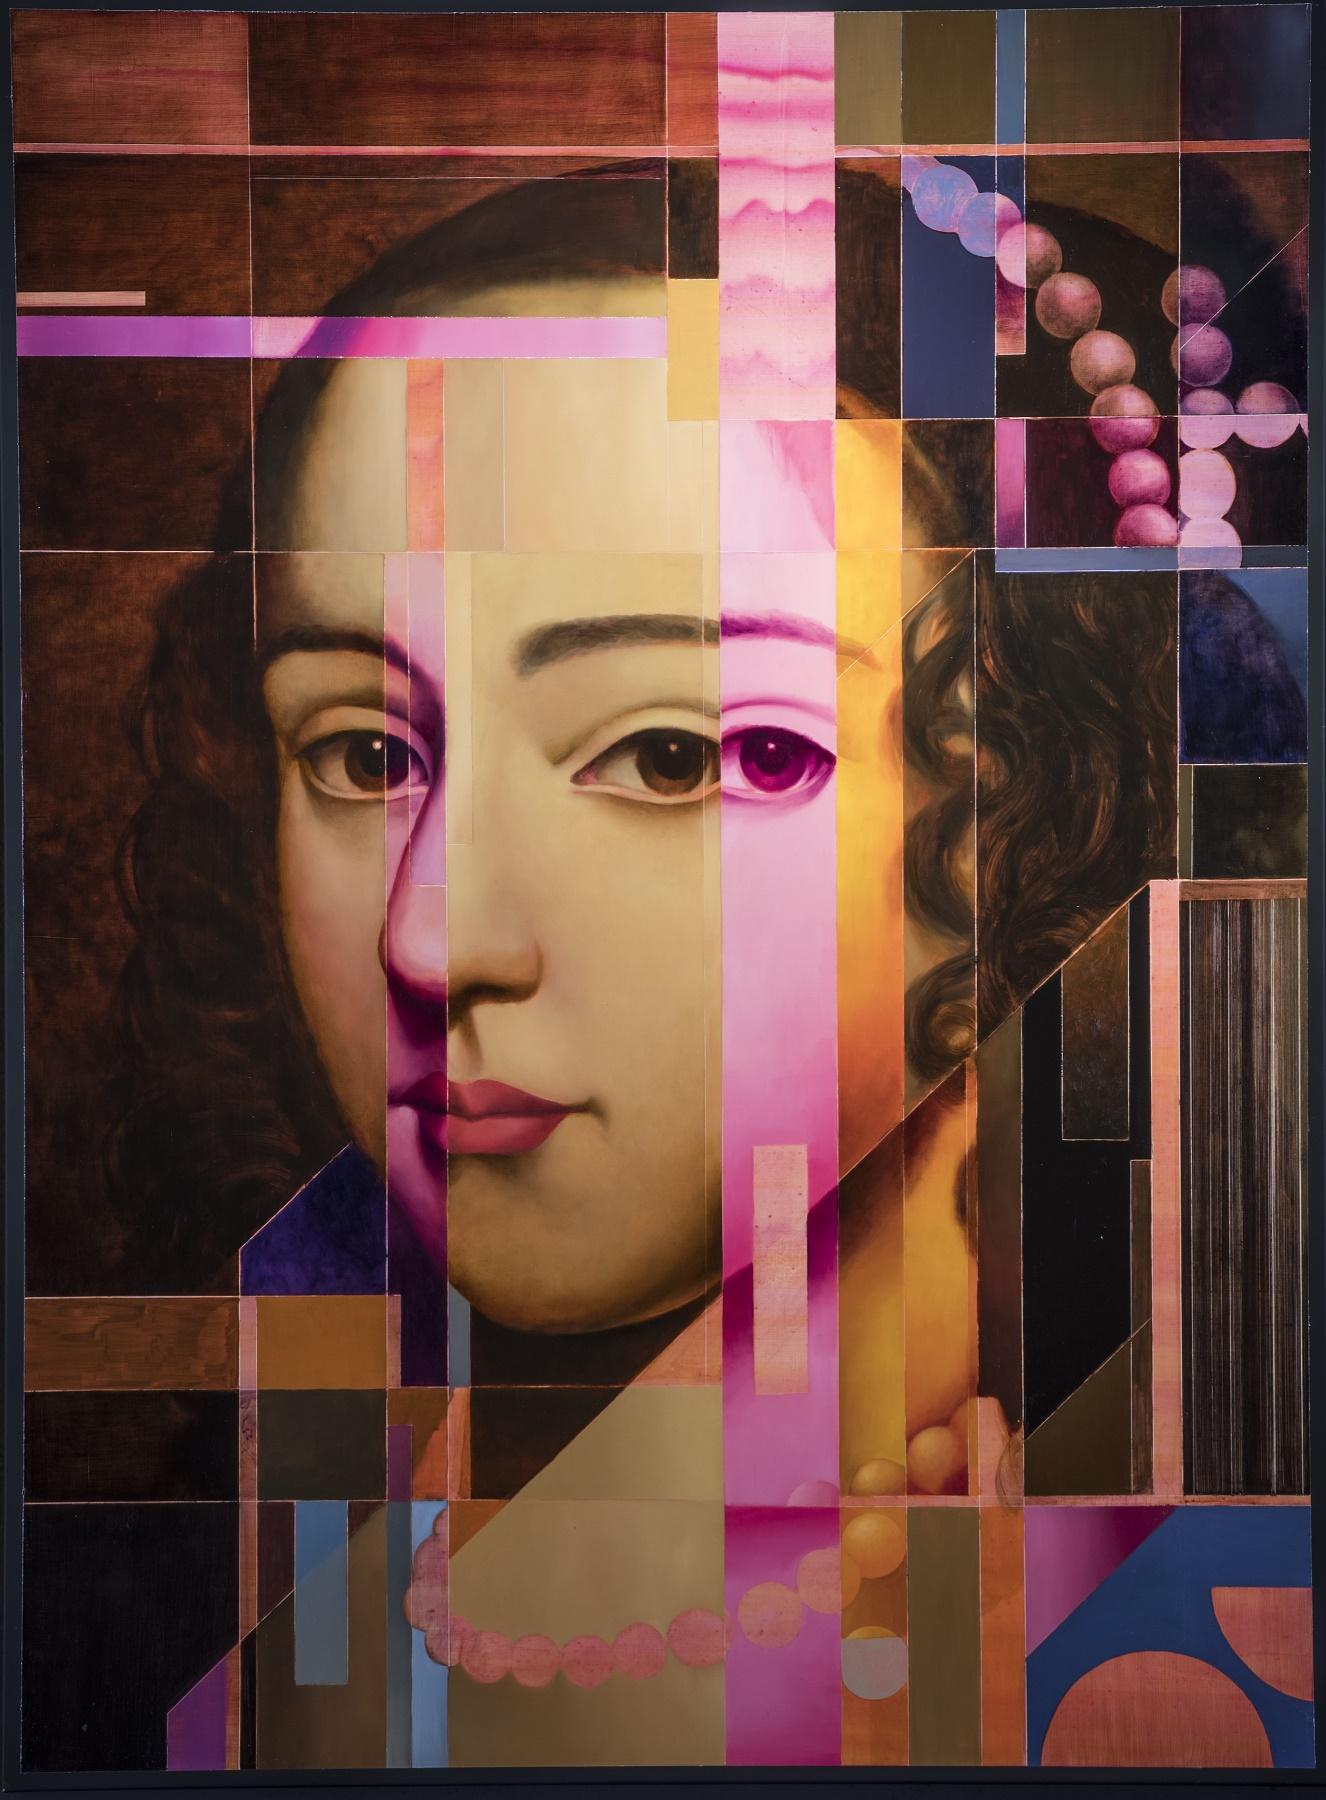 Misrepresentation of Electress Sophia of Hanover